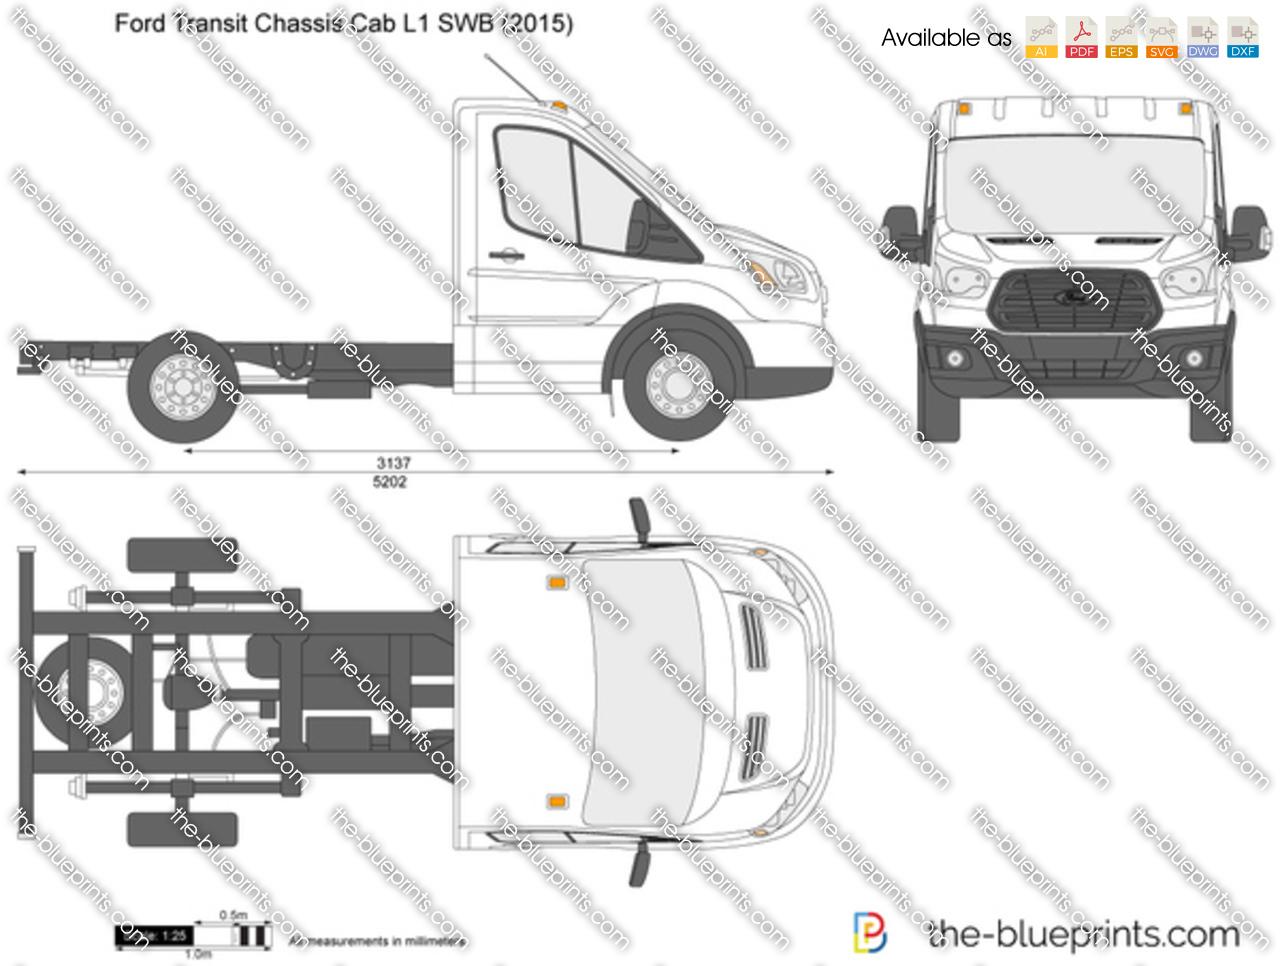 Ford Transit Chassis Cab L1 SWB 2016